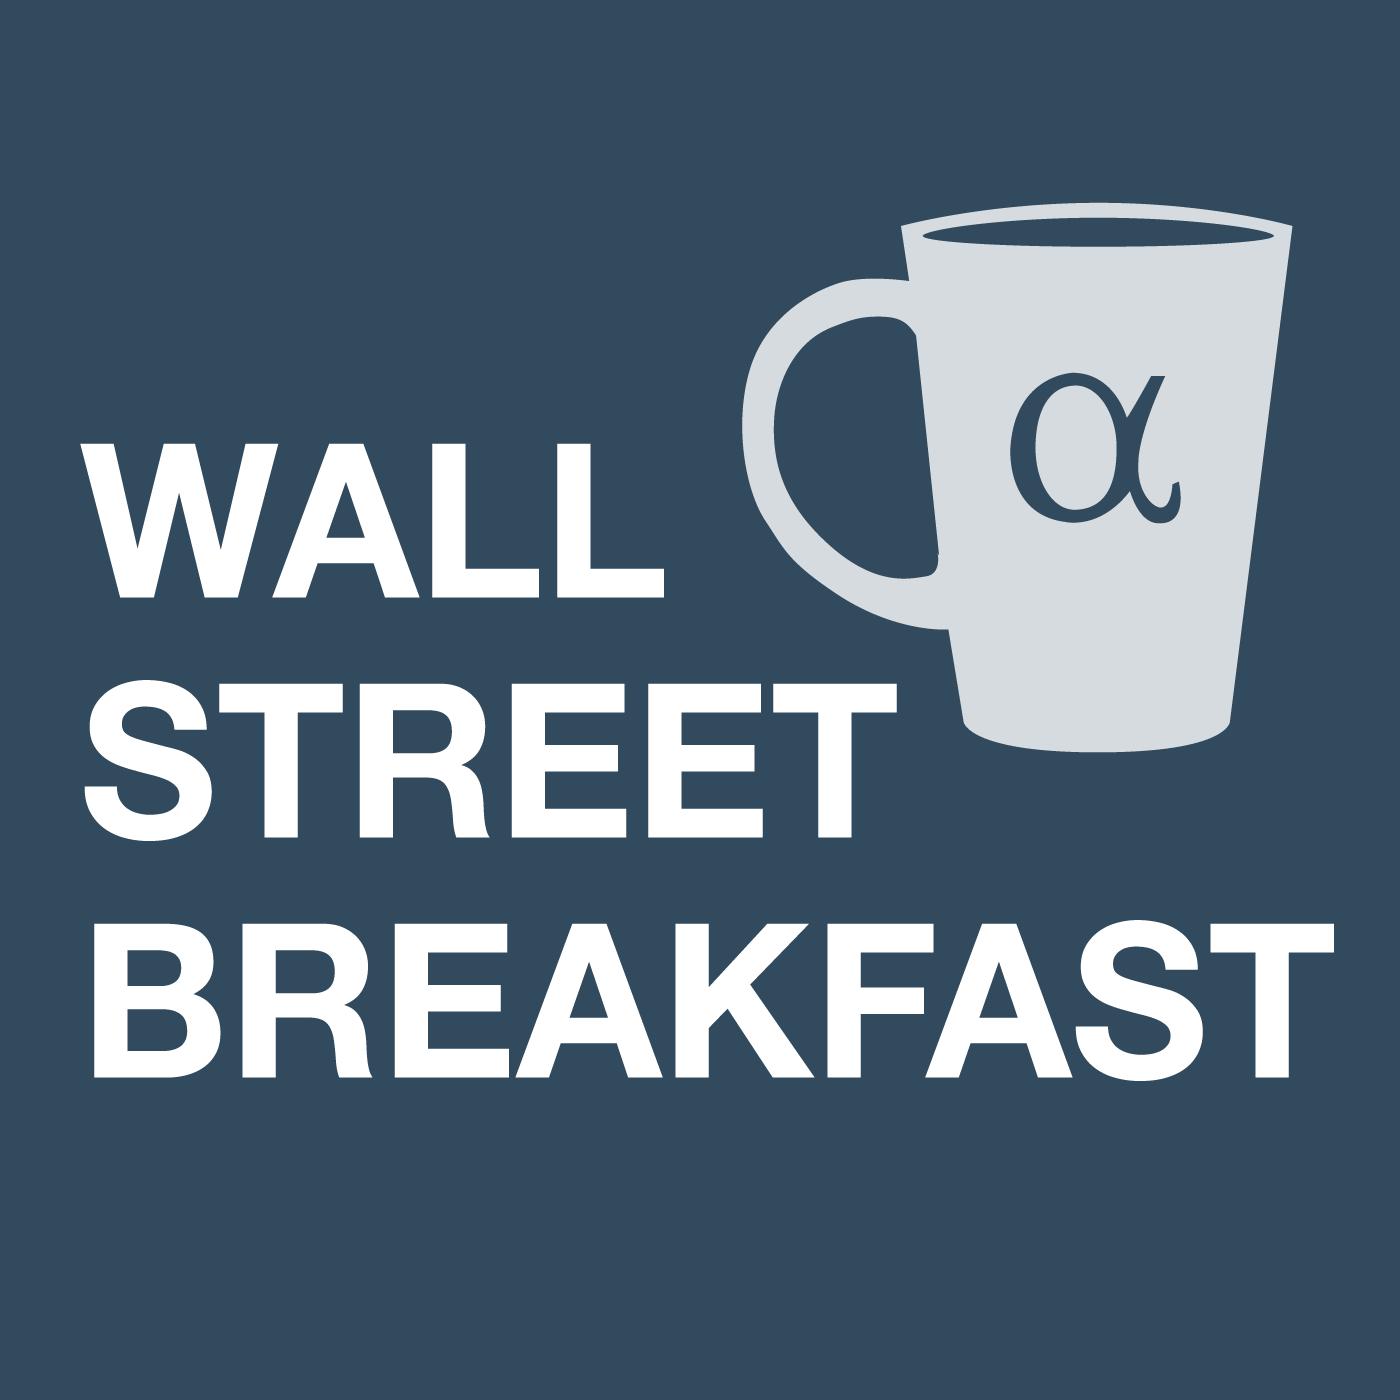 Wall Street Breakfast August 5: Gold, Stimulus, Trade